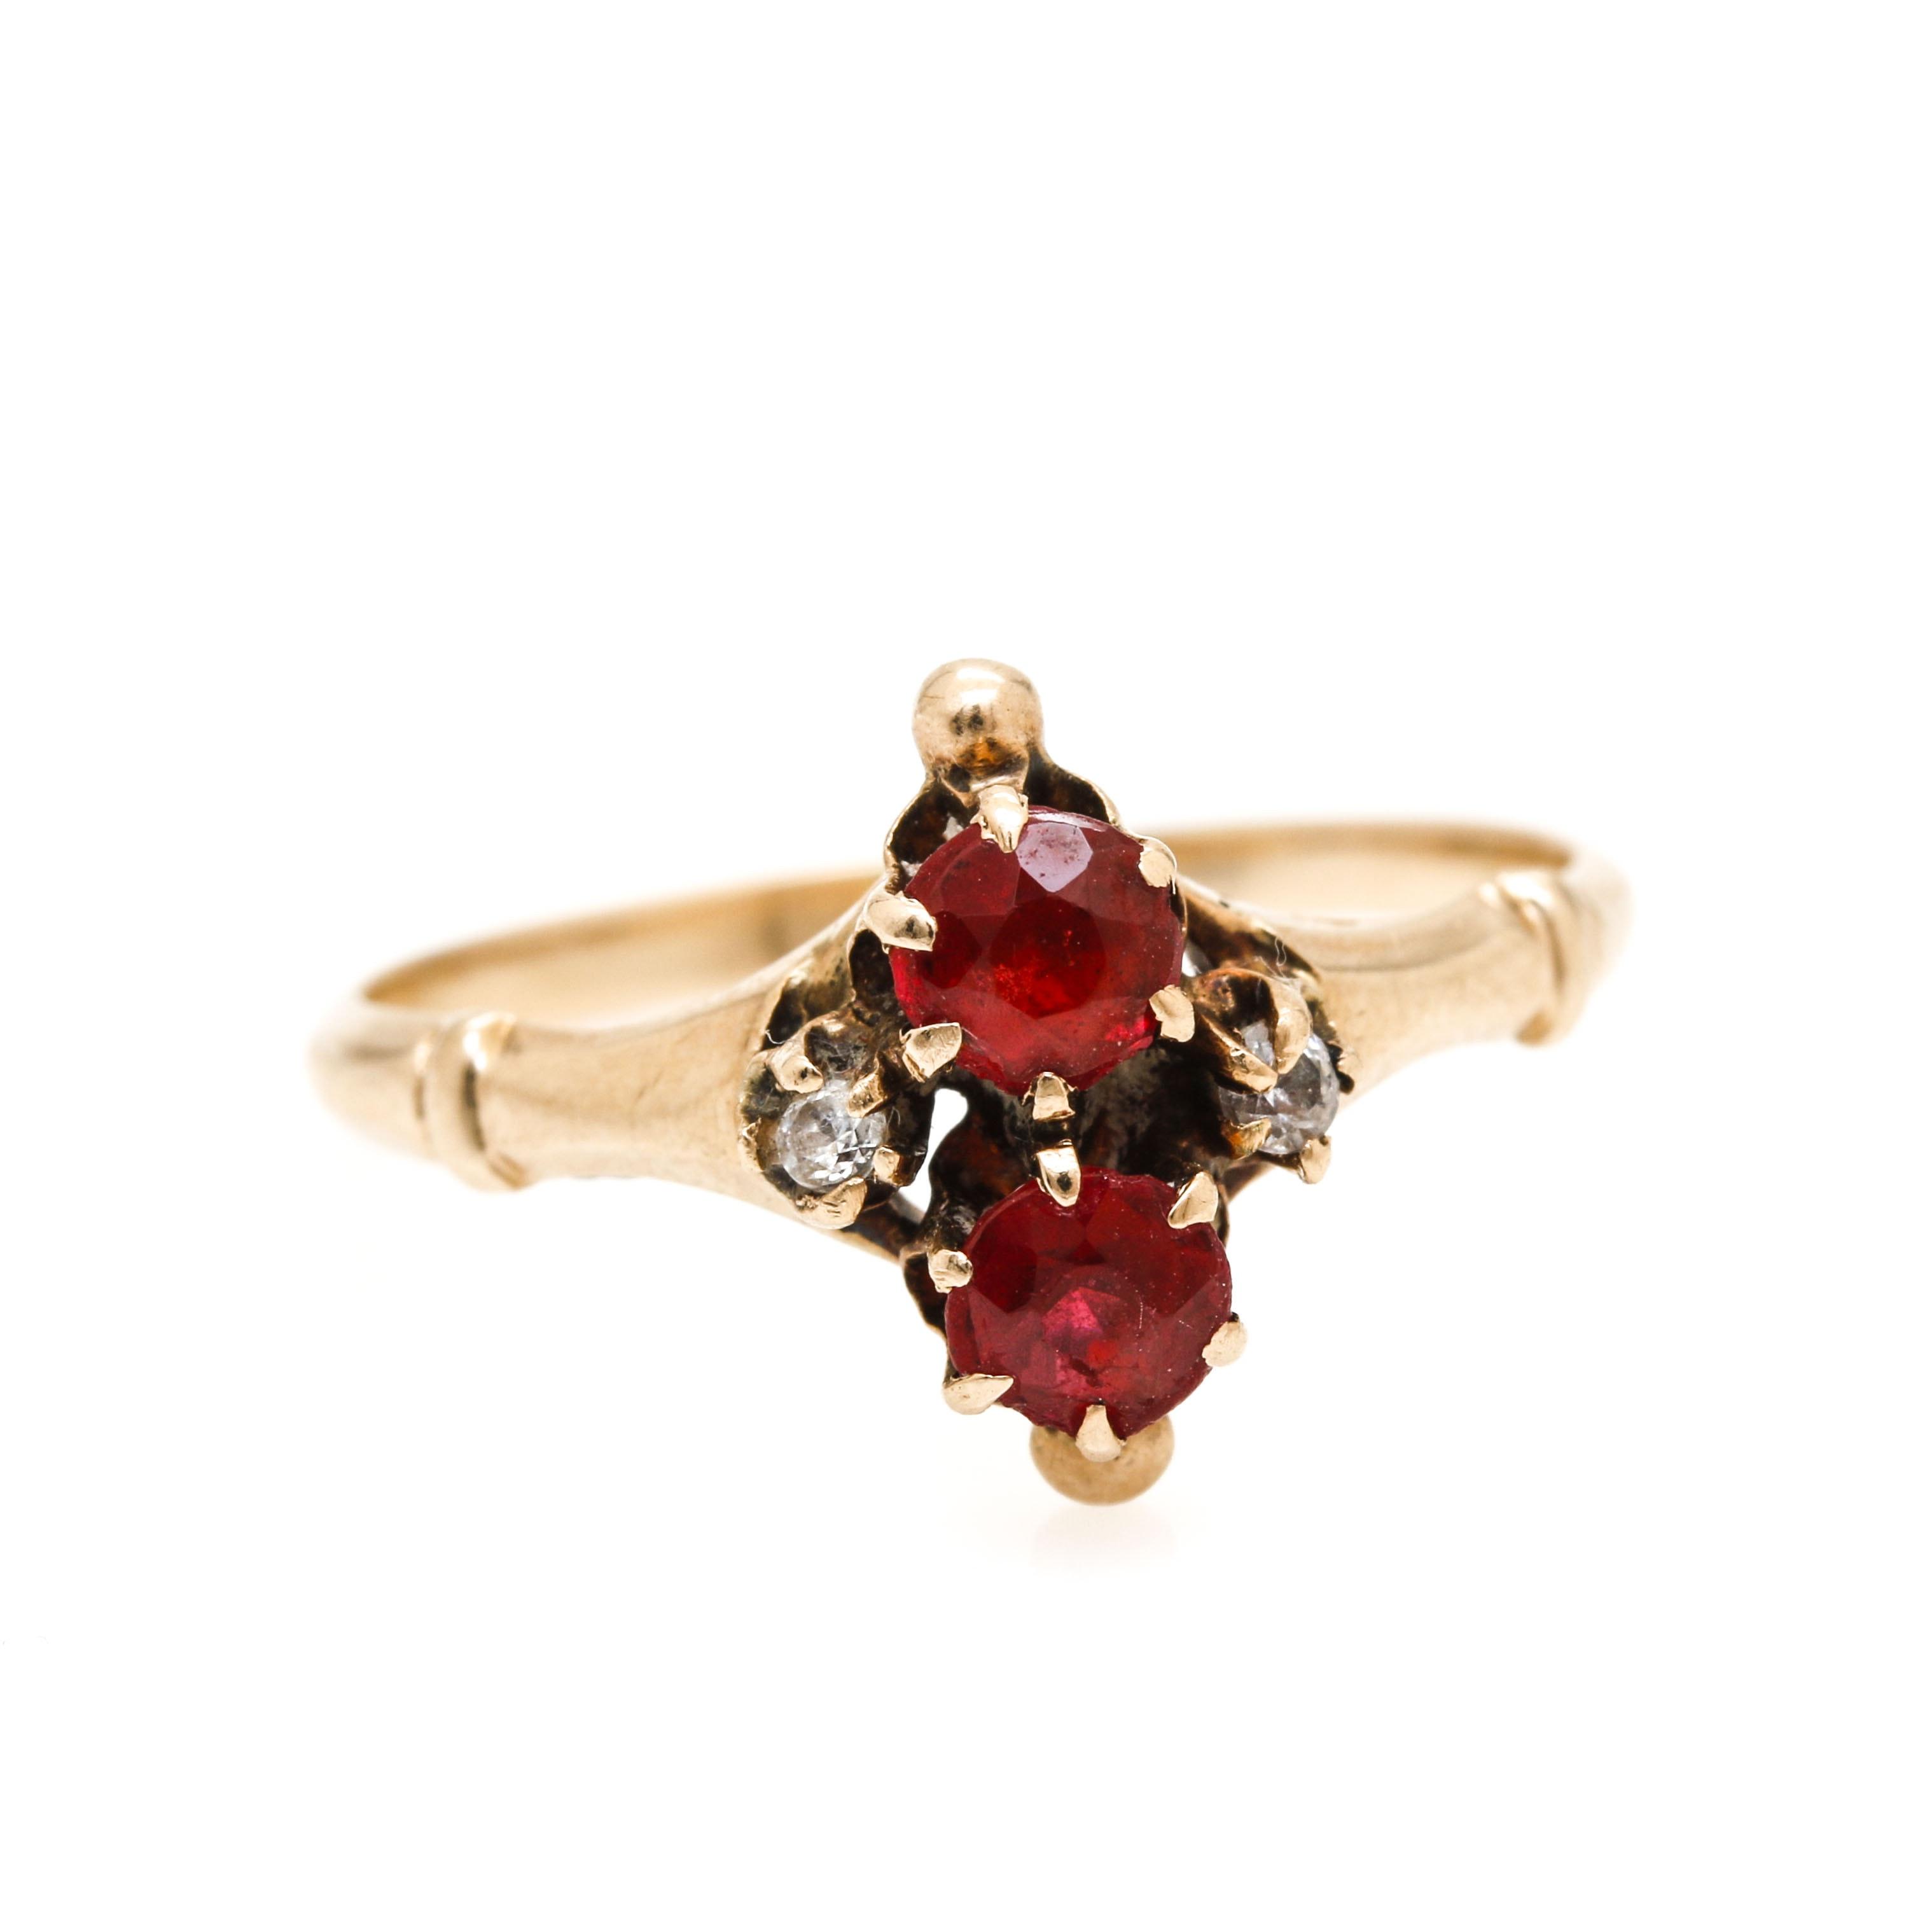 10K Yellow Gold Garnet and Cubic Zirconia Ring